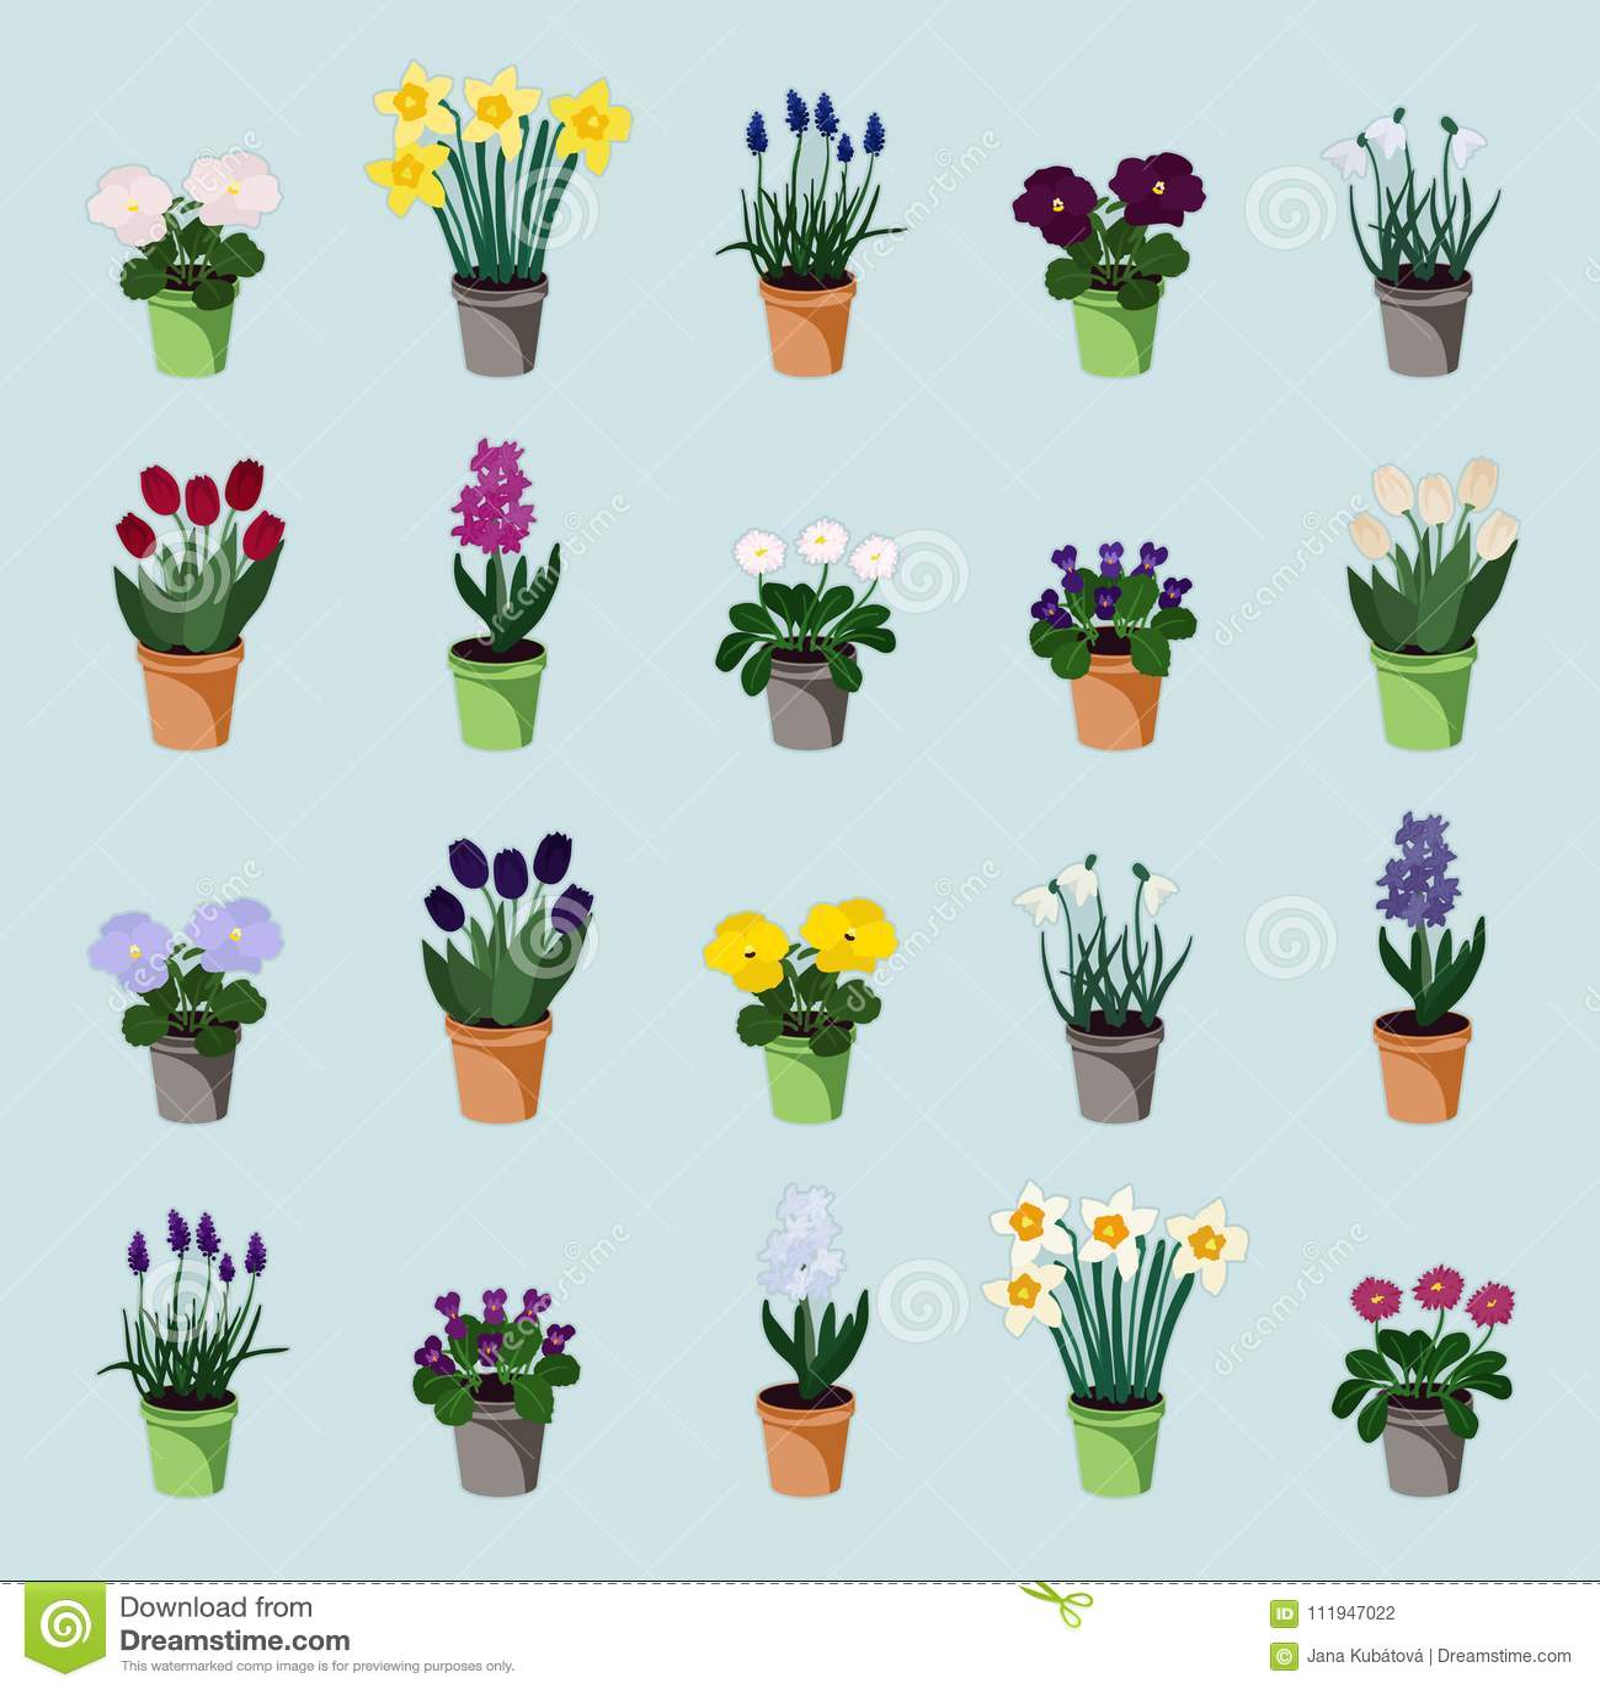 Potted Spring Flowers Stock Vector Illustration Of Violet 111947022